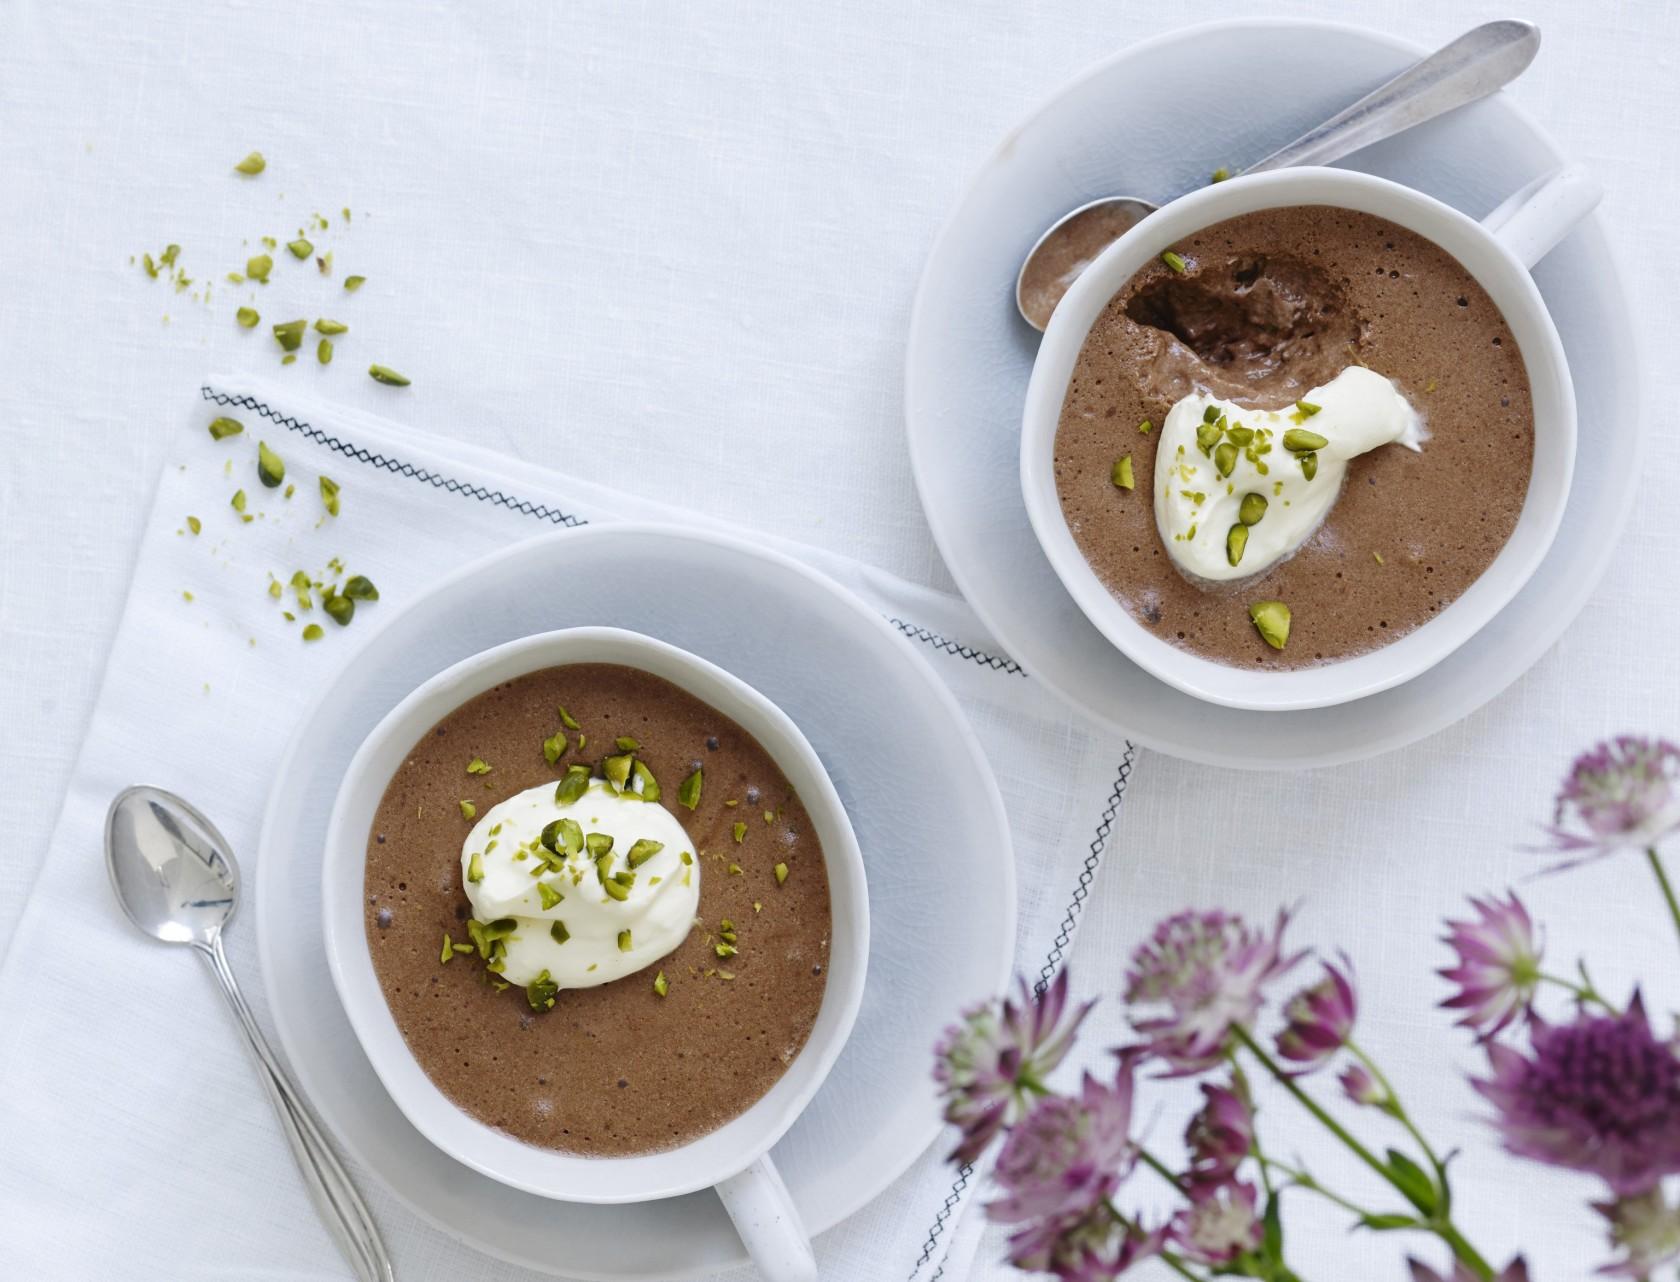 Lys chokolademousse med pistacienødder